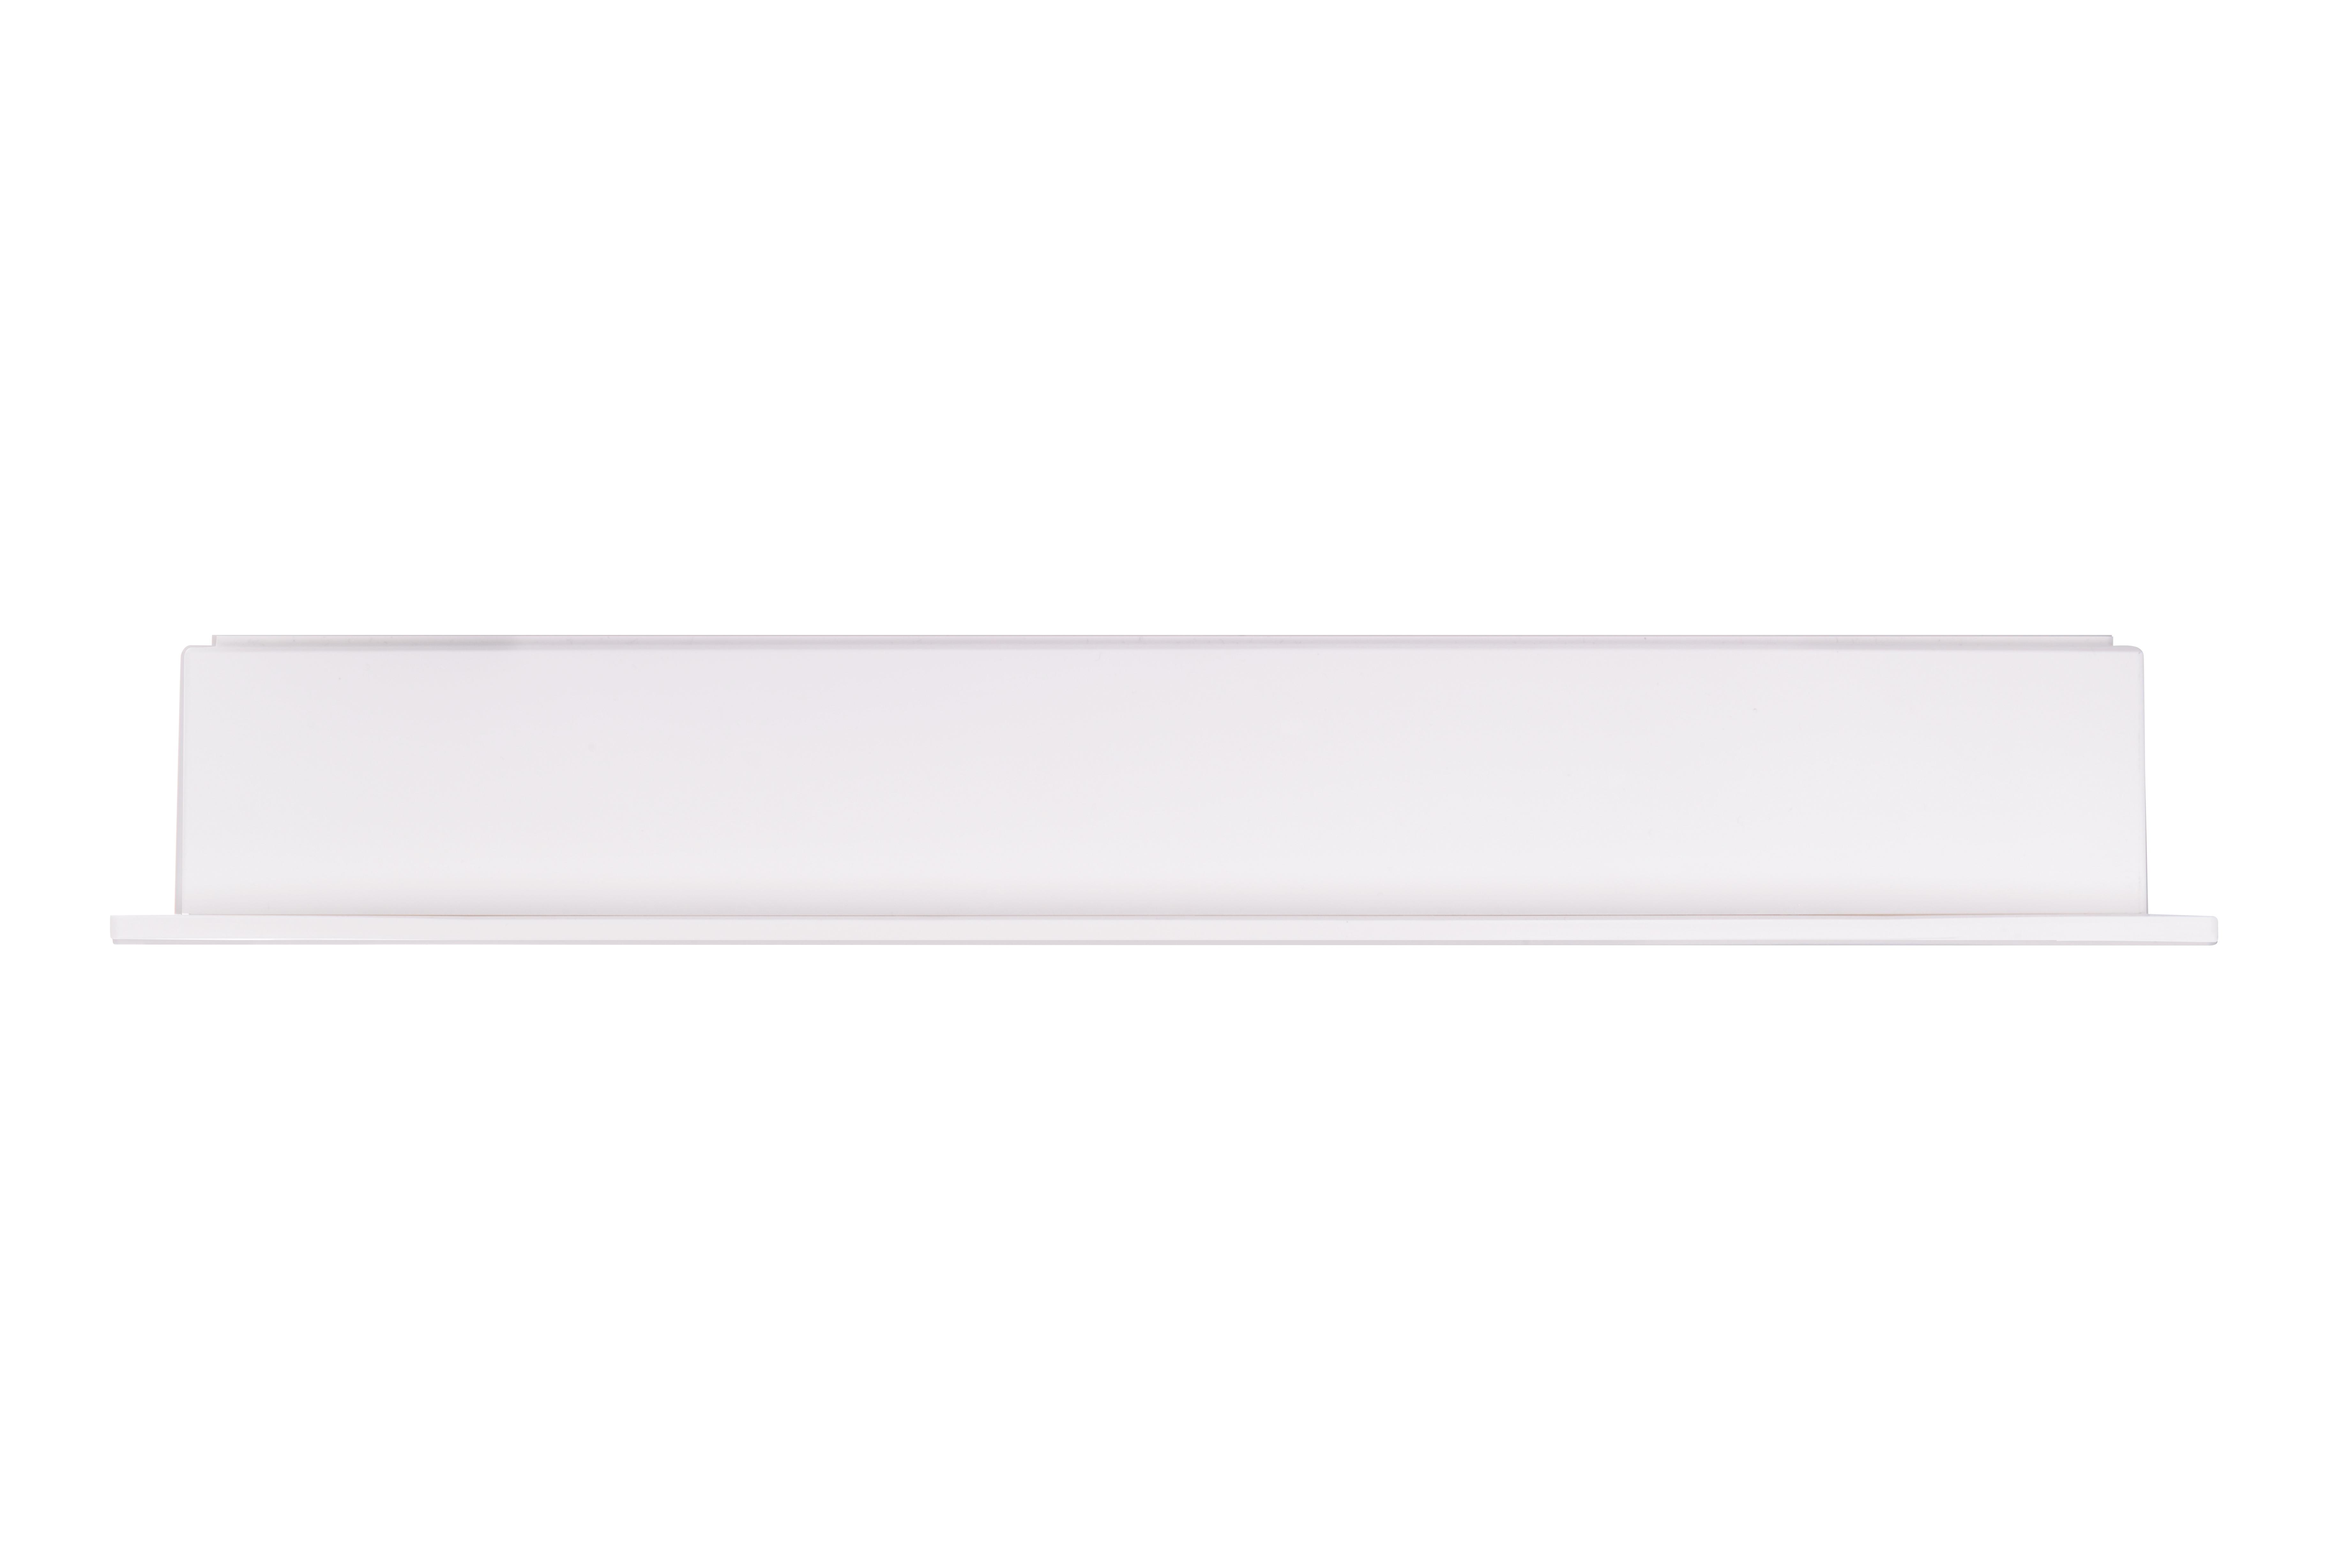 Lampa emergenta led Intelight 94658   3h mentinut test automat 5